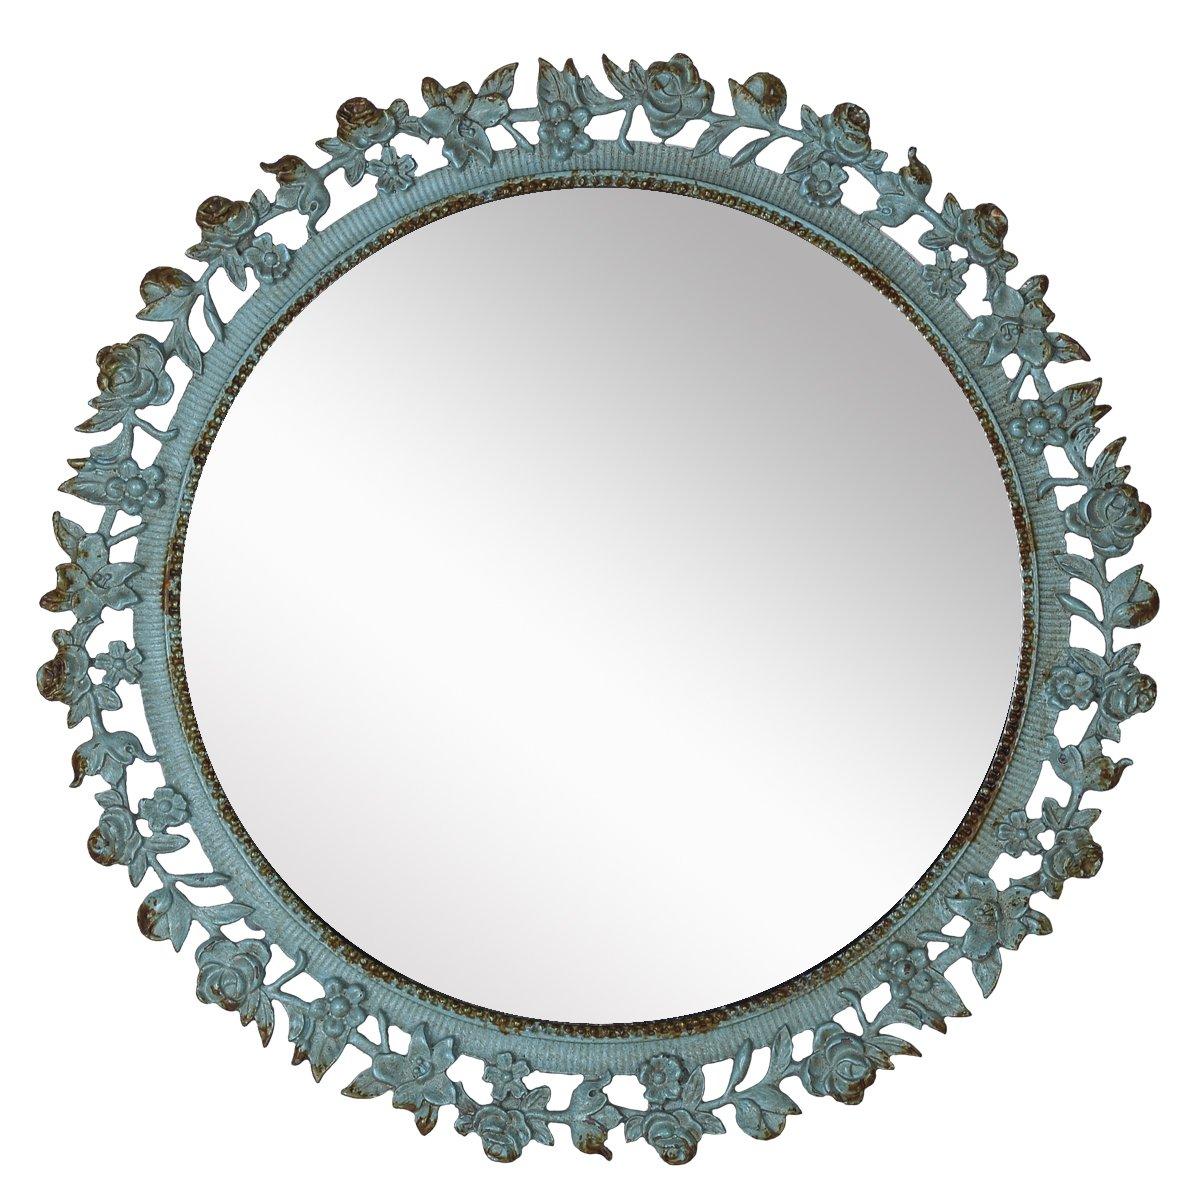 NIKKY HOME Decorative Vintage Pewter Round Vanity Makeup Mirror Lace Border, Aqua, 9.3'' x 9.3'' x 1.8''